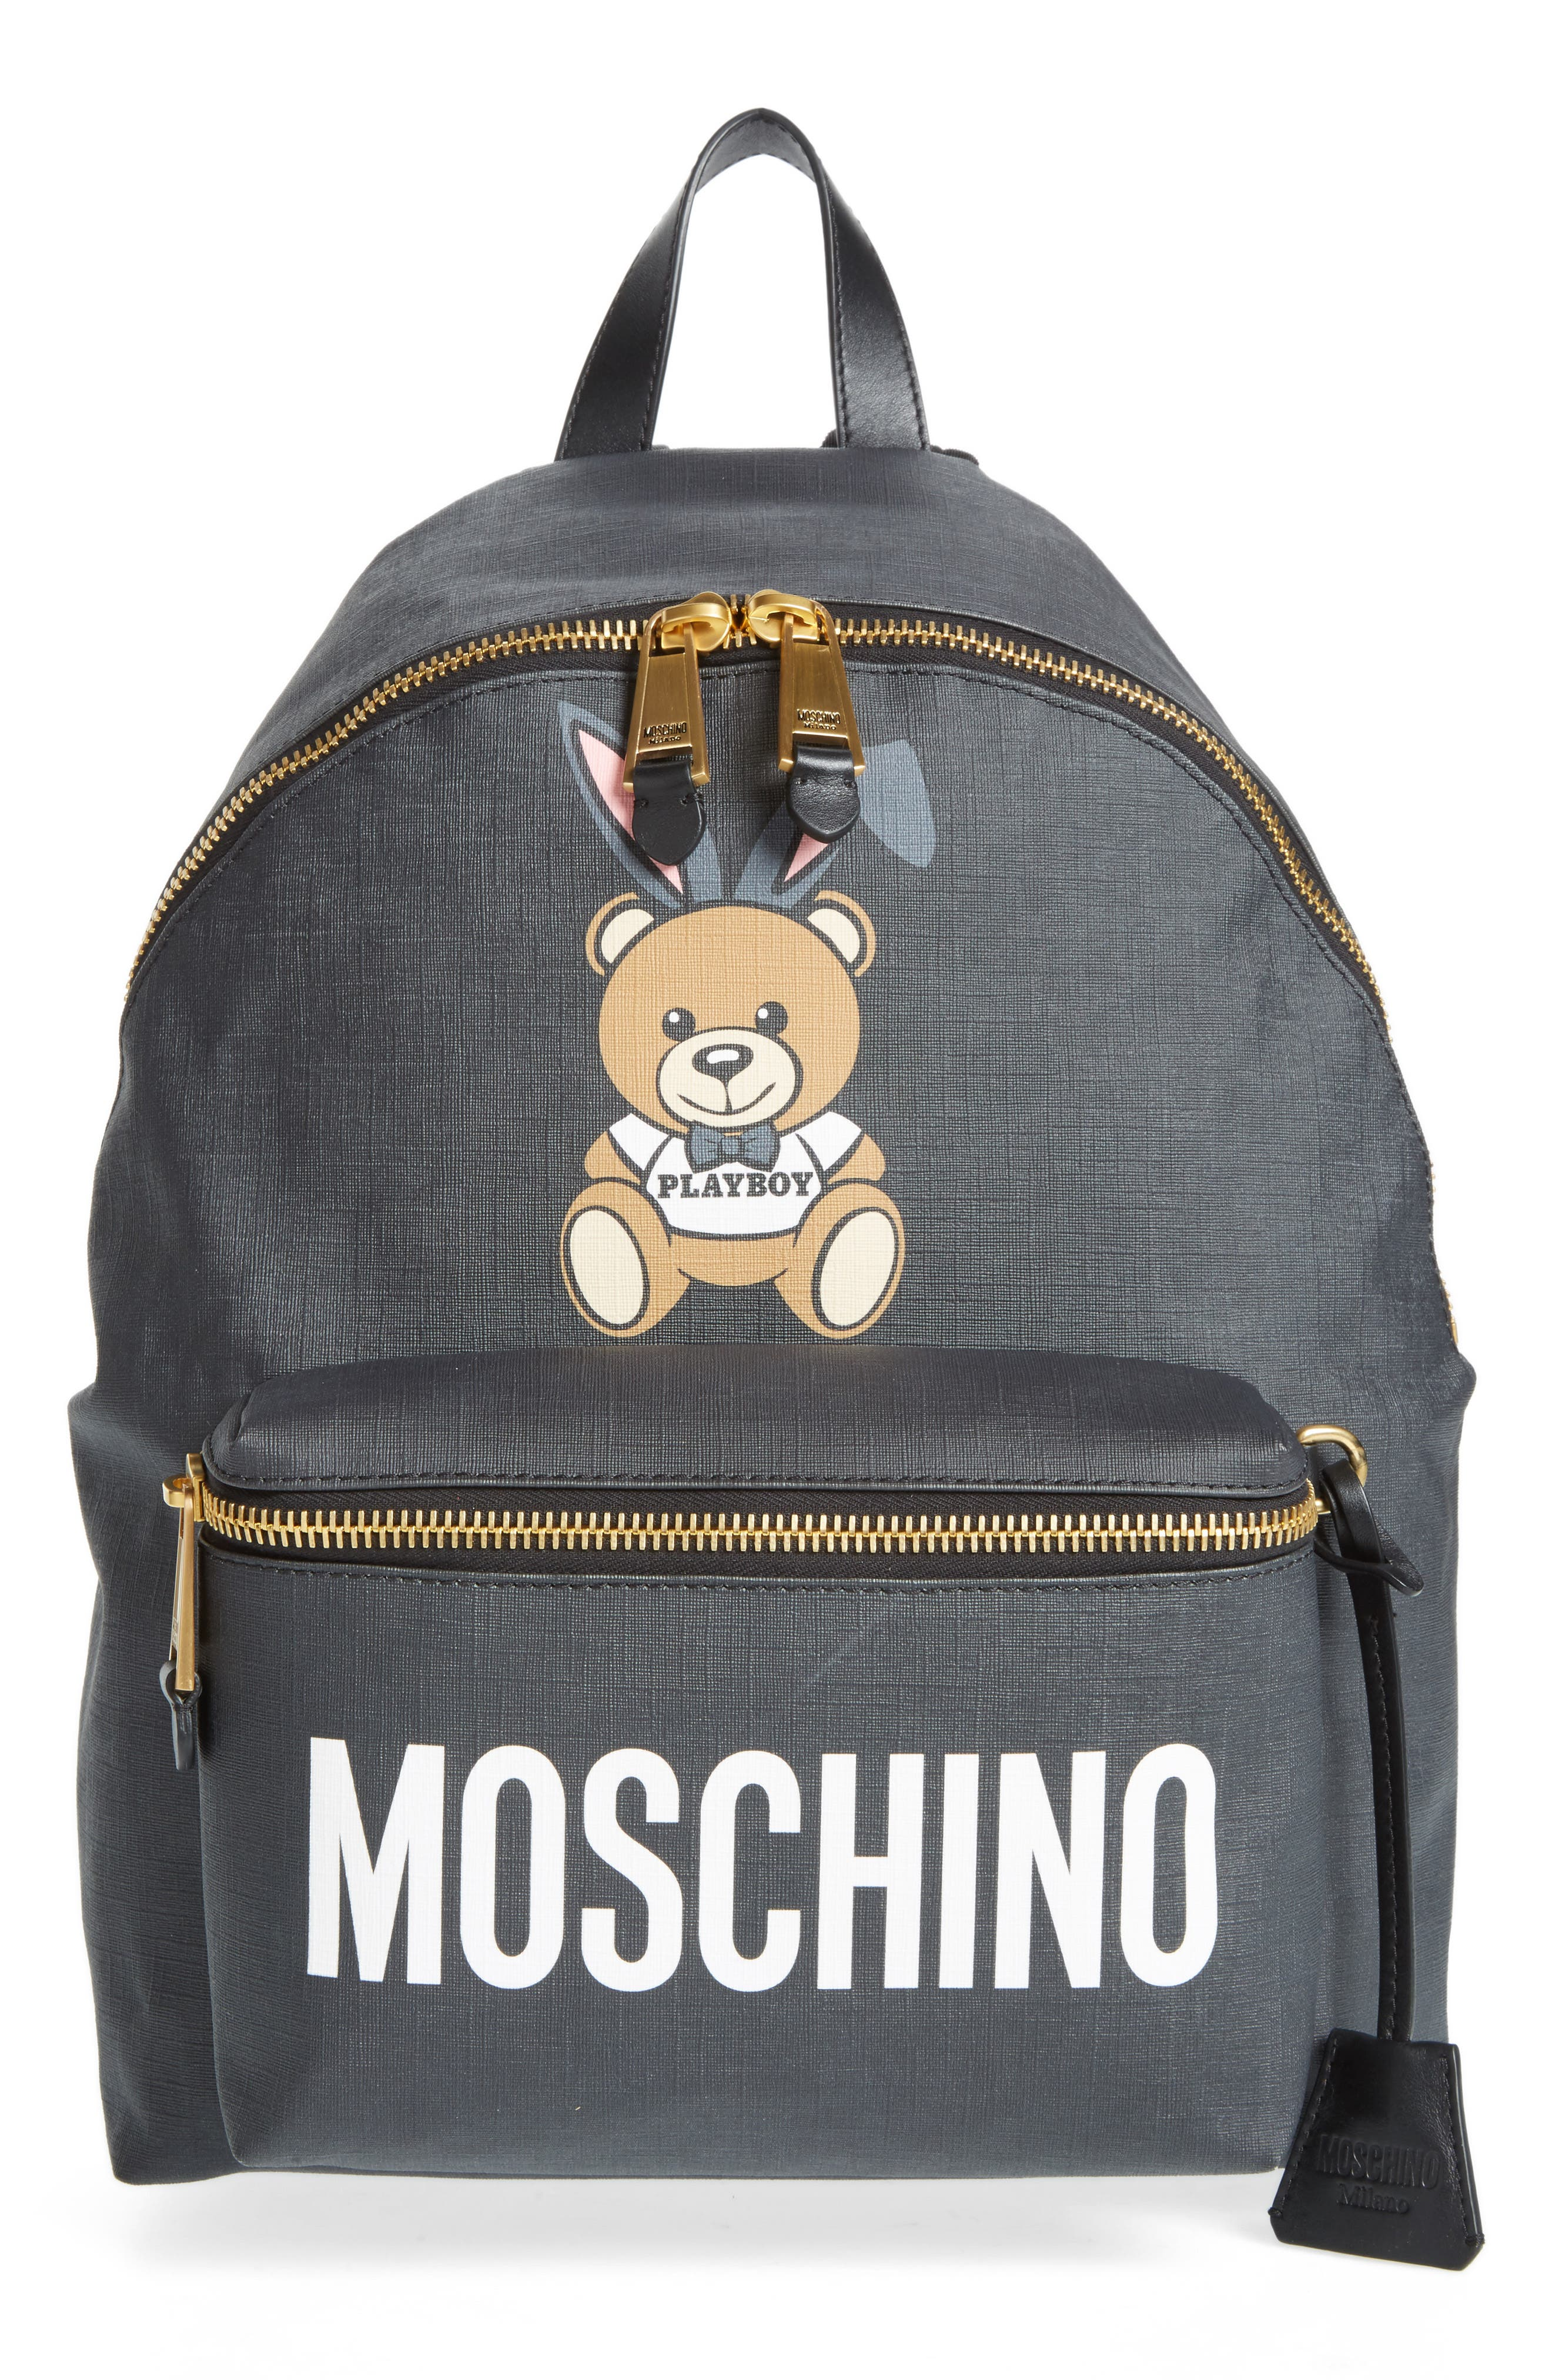 Main Image - Moschino x Playboy Large Bunny Bear Woven Backpack